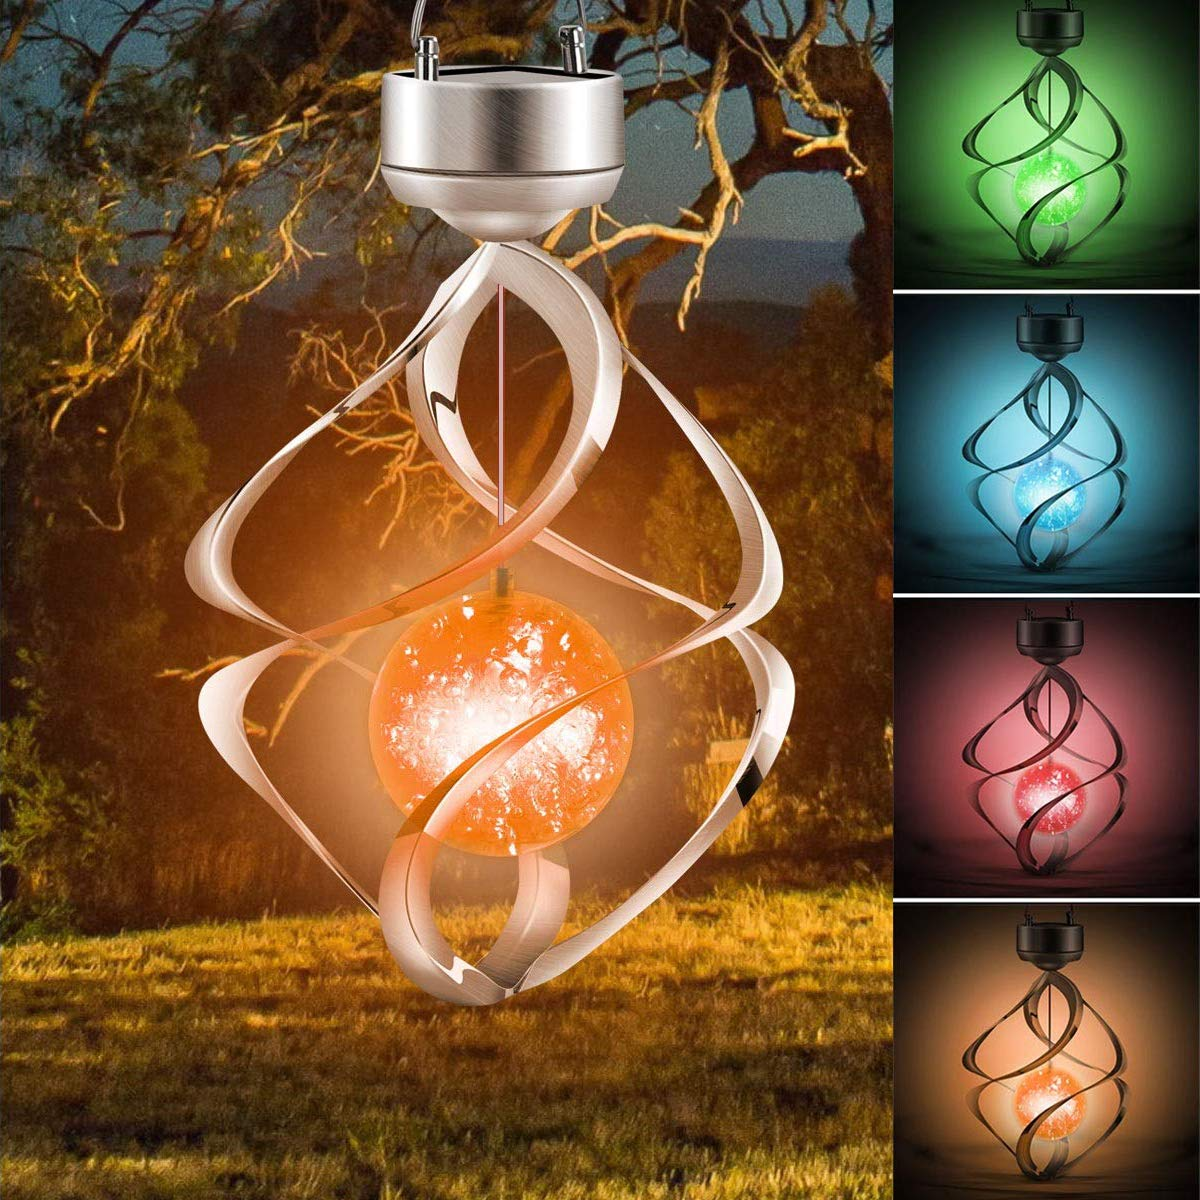 LED Solar Wind Chime Light Halloween Spiral Pumpkin Garden Lamp for Yard